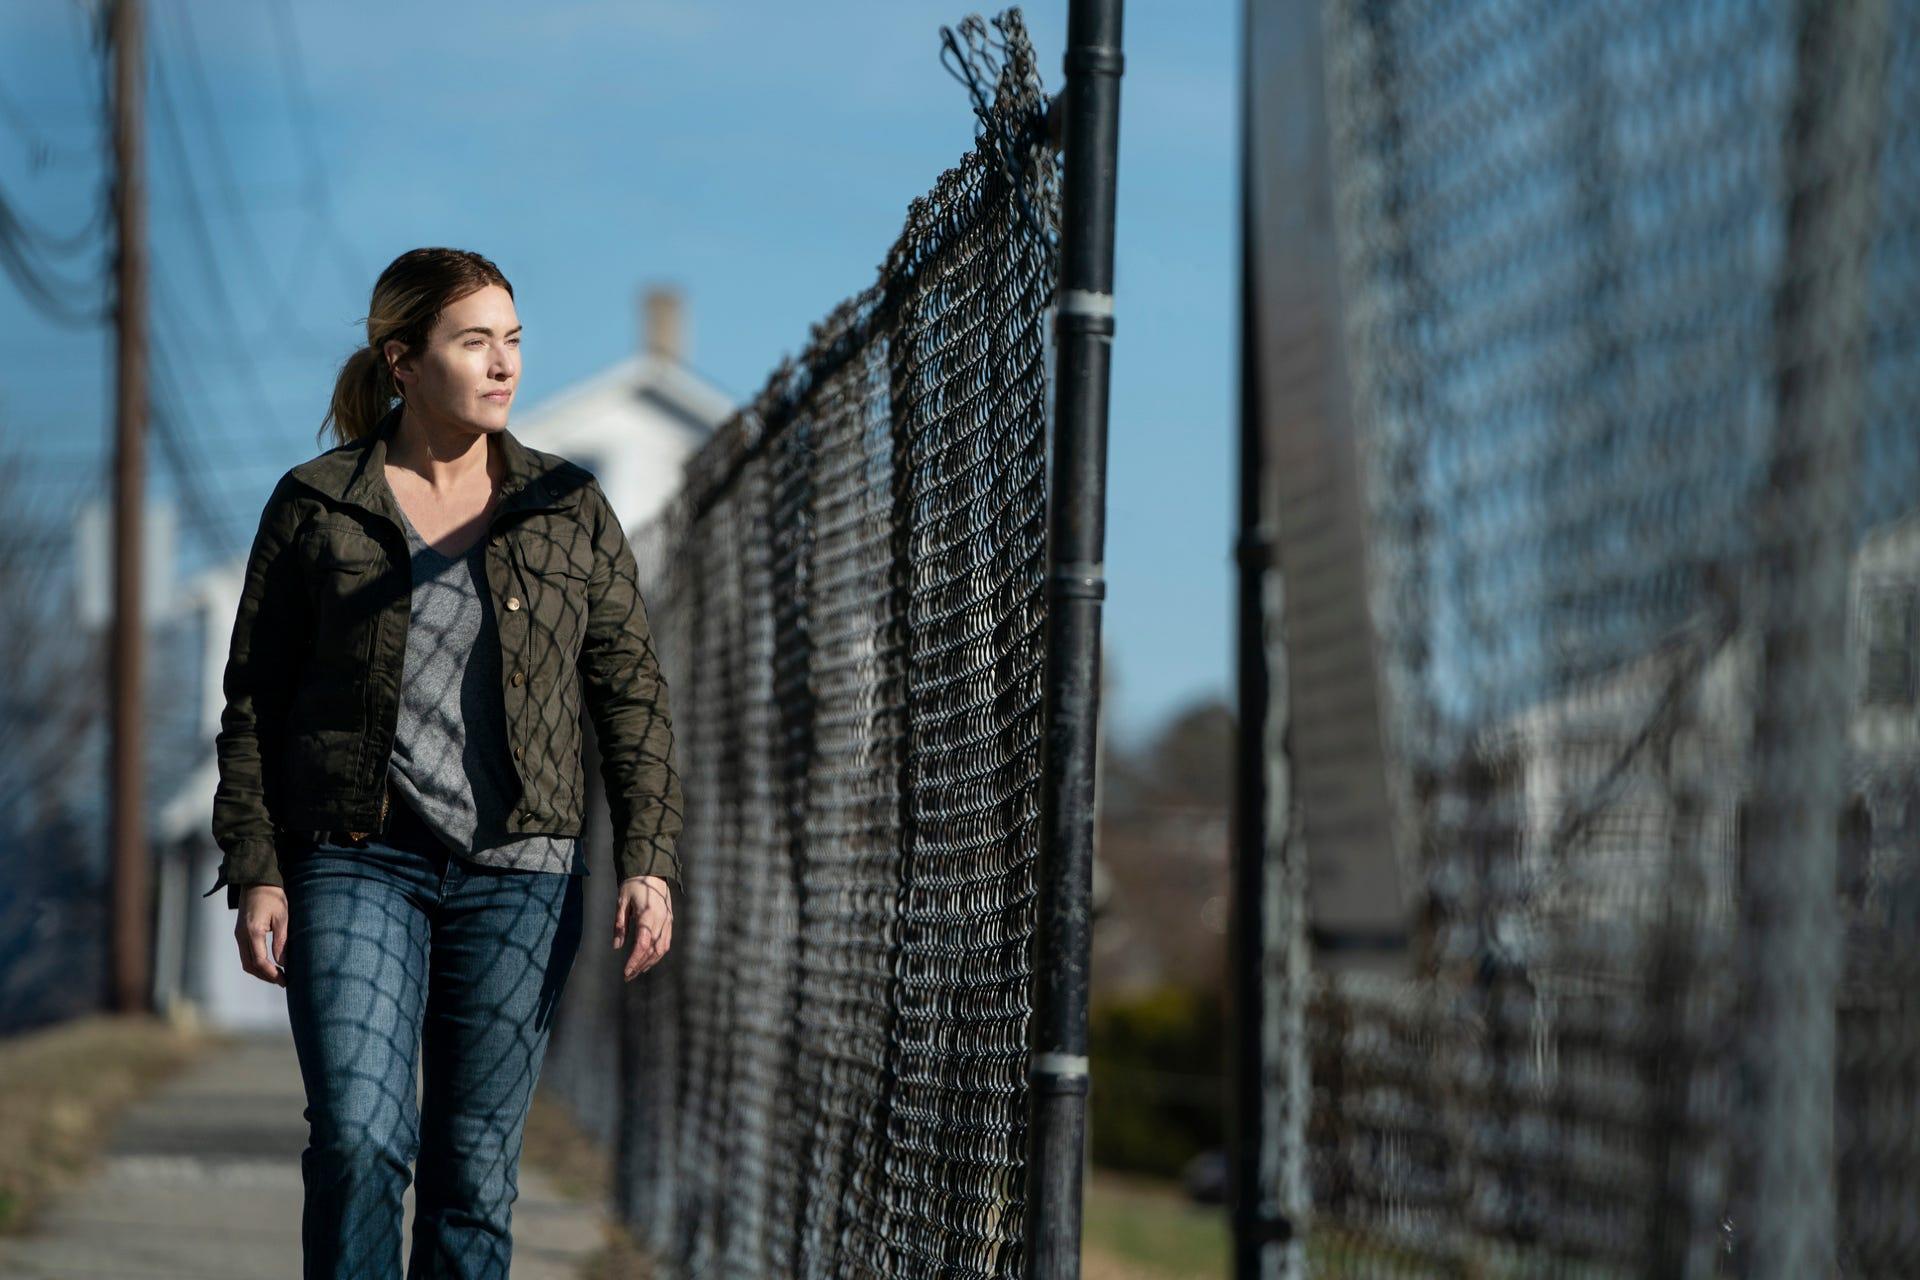 Mare z Easttown serial finał recenzja opinie